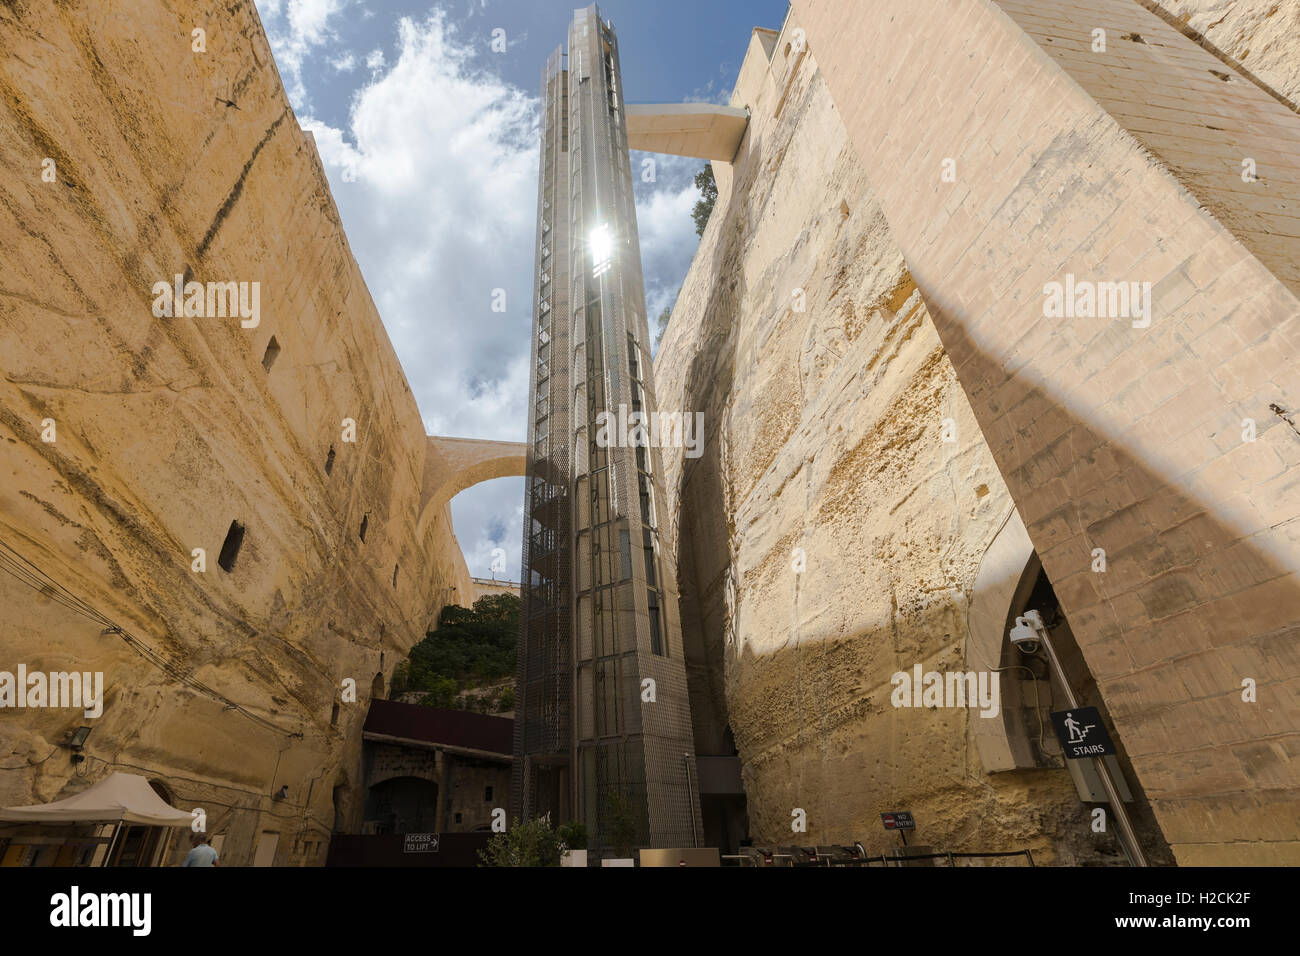 Upper Barrakka Lift, Valletta, Malta - Stock Image